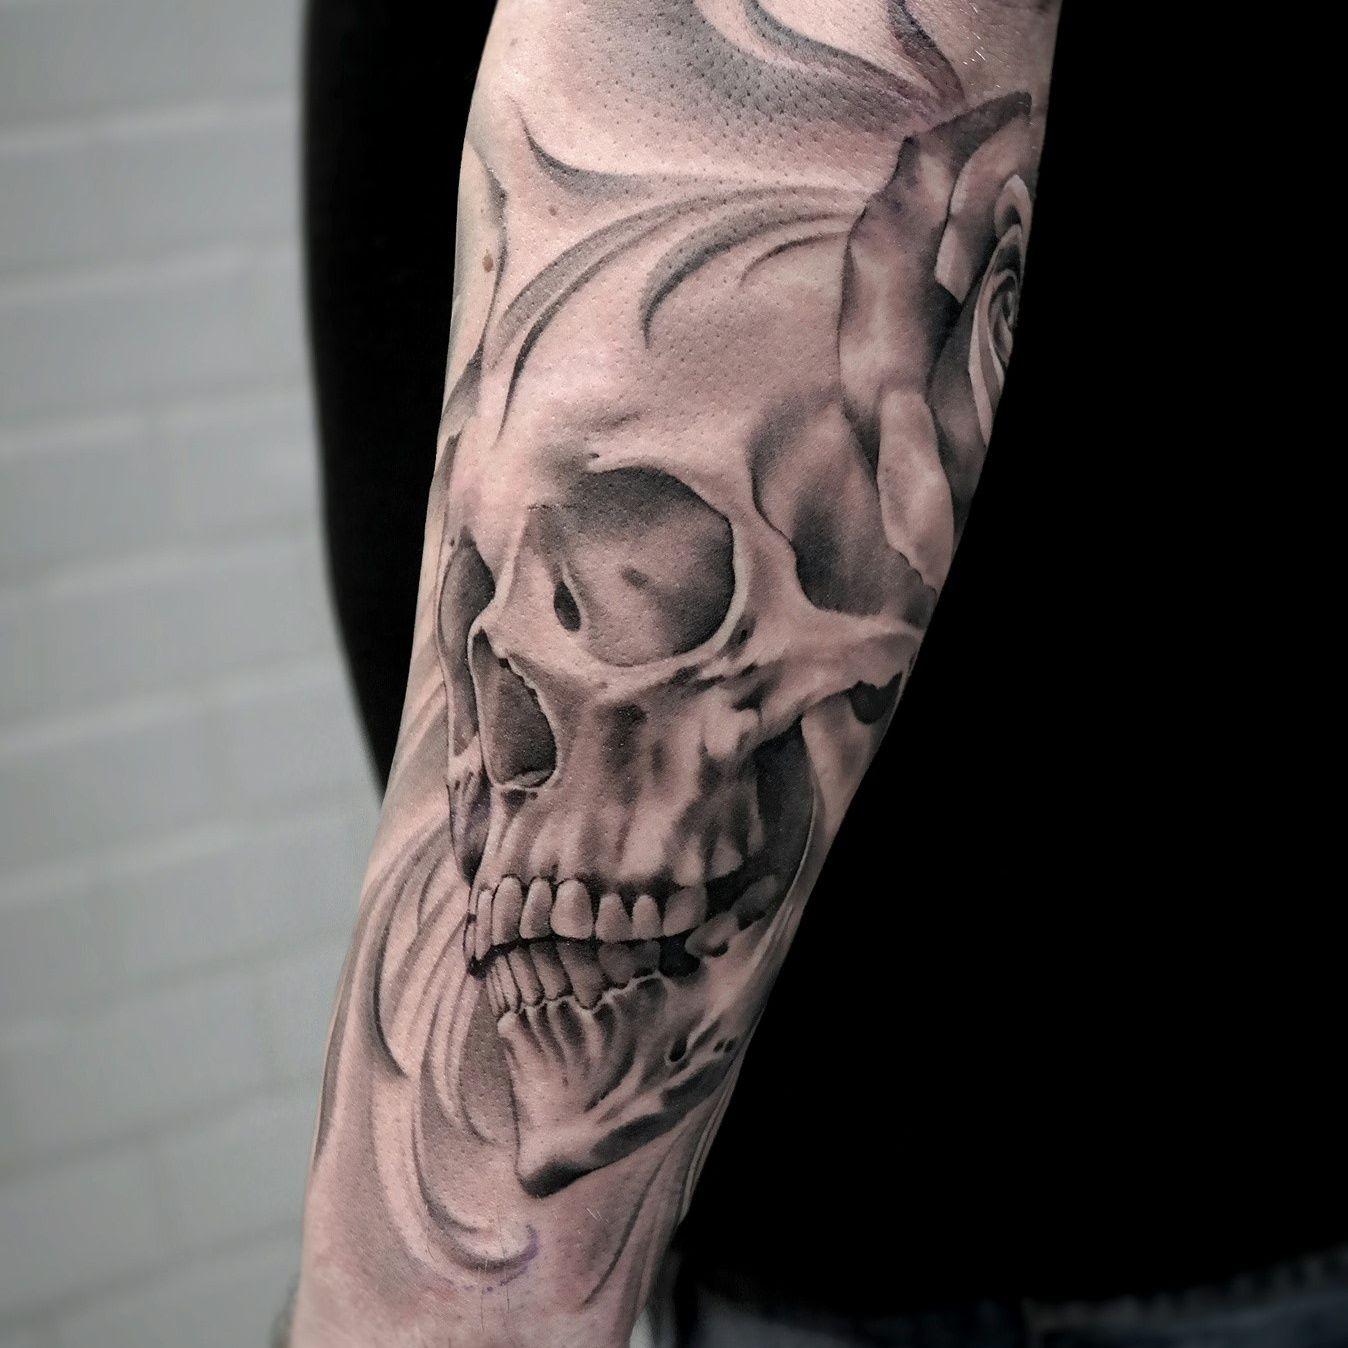 @makaivio_desenhos   tattoo   Pinterest   Tattoo   Black And Grey Skull Tattoo Designs